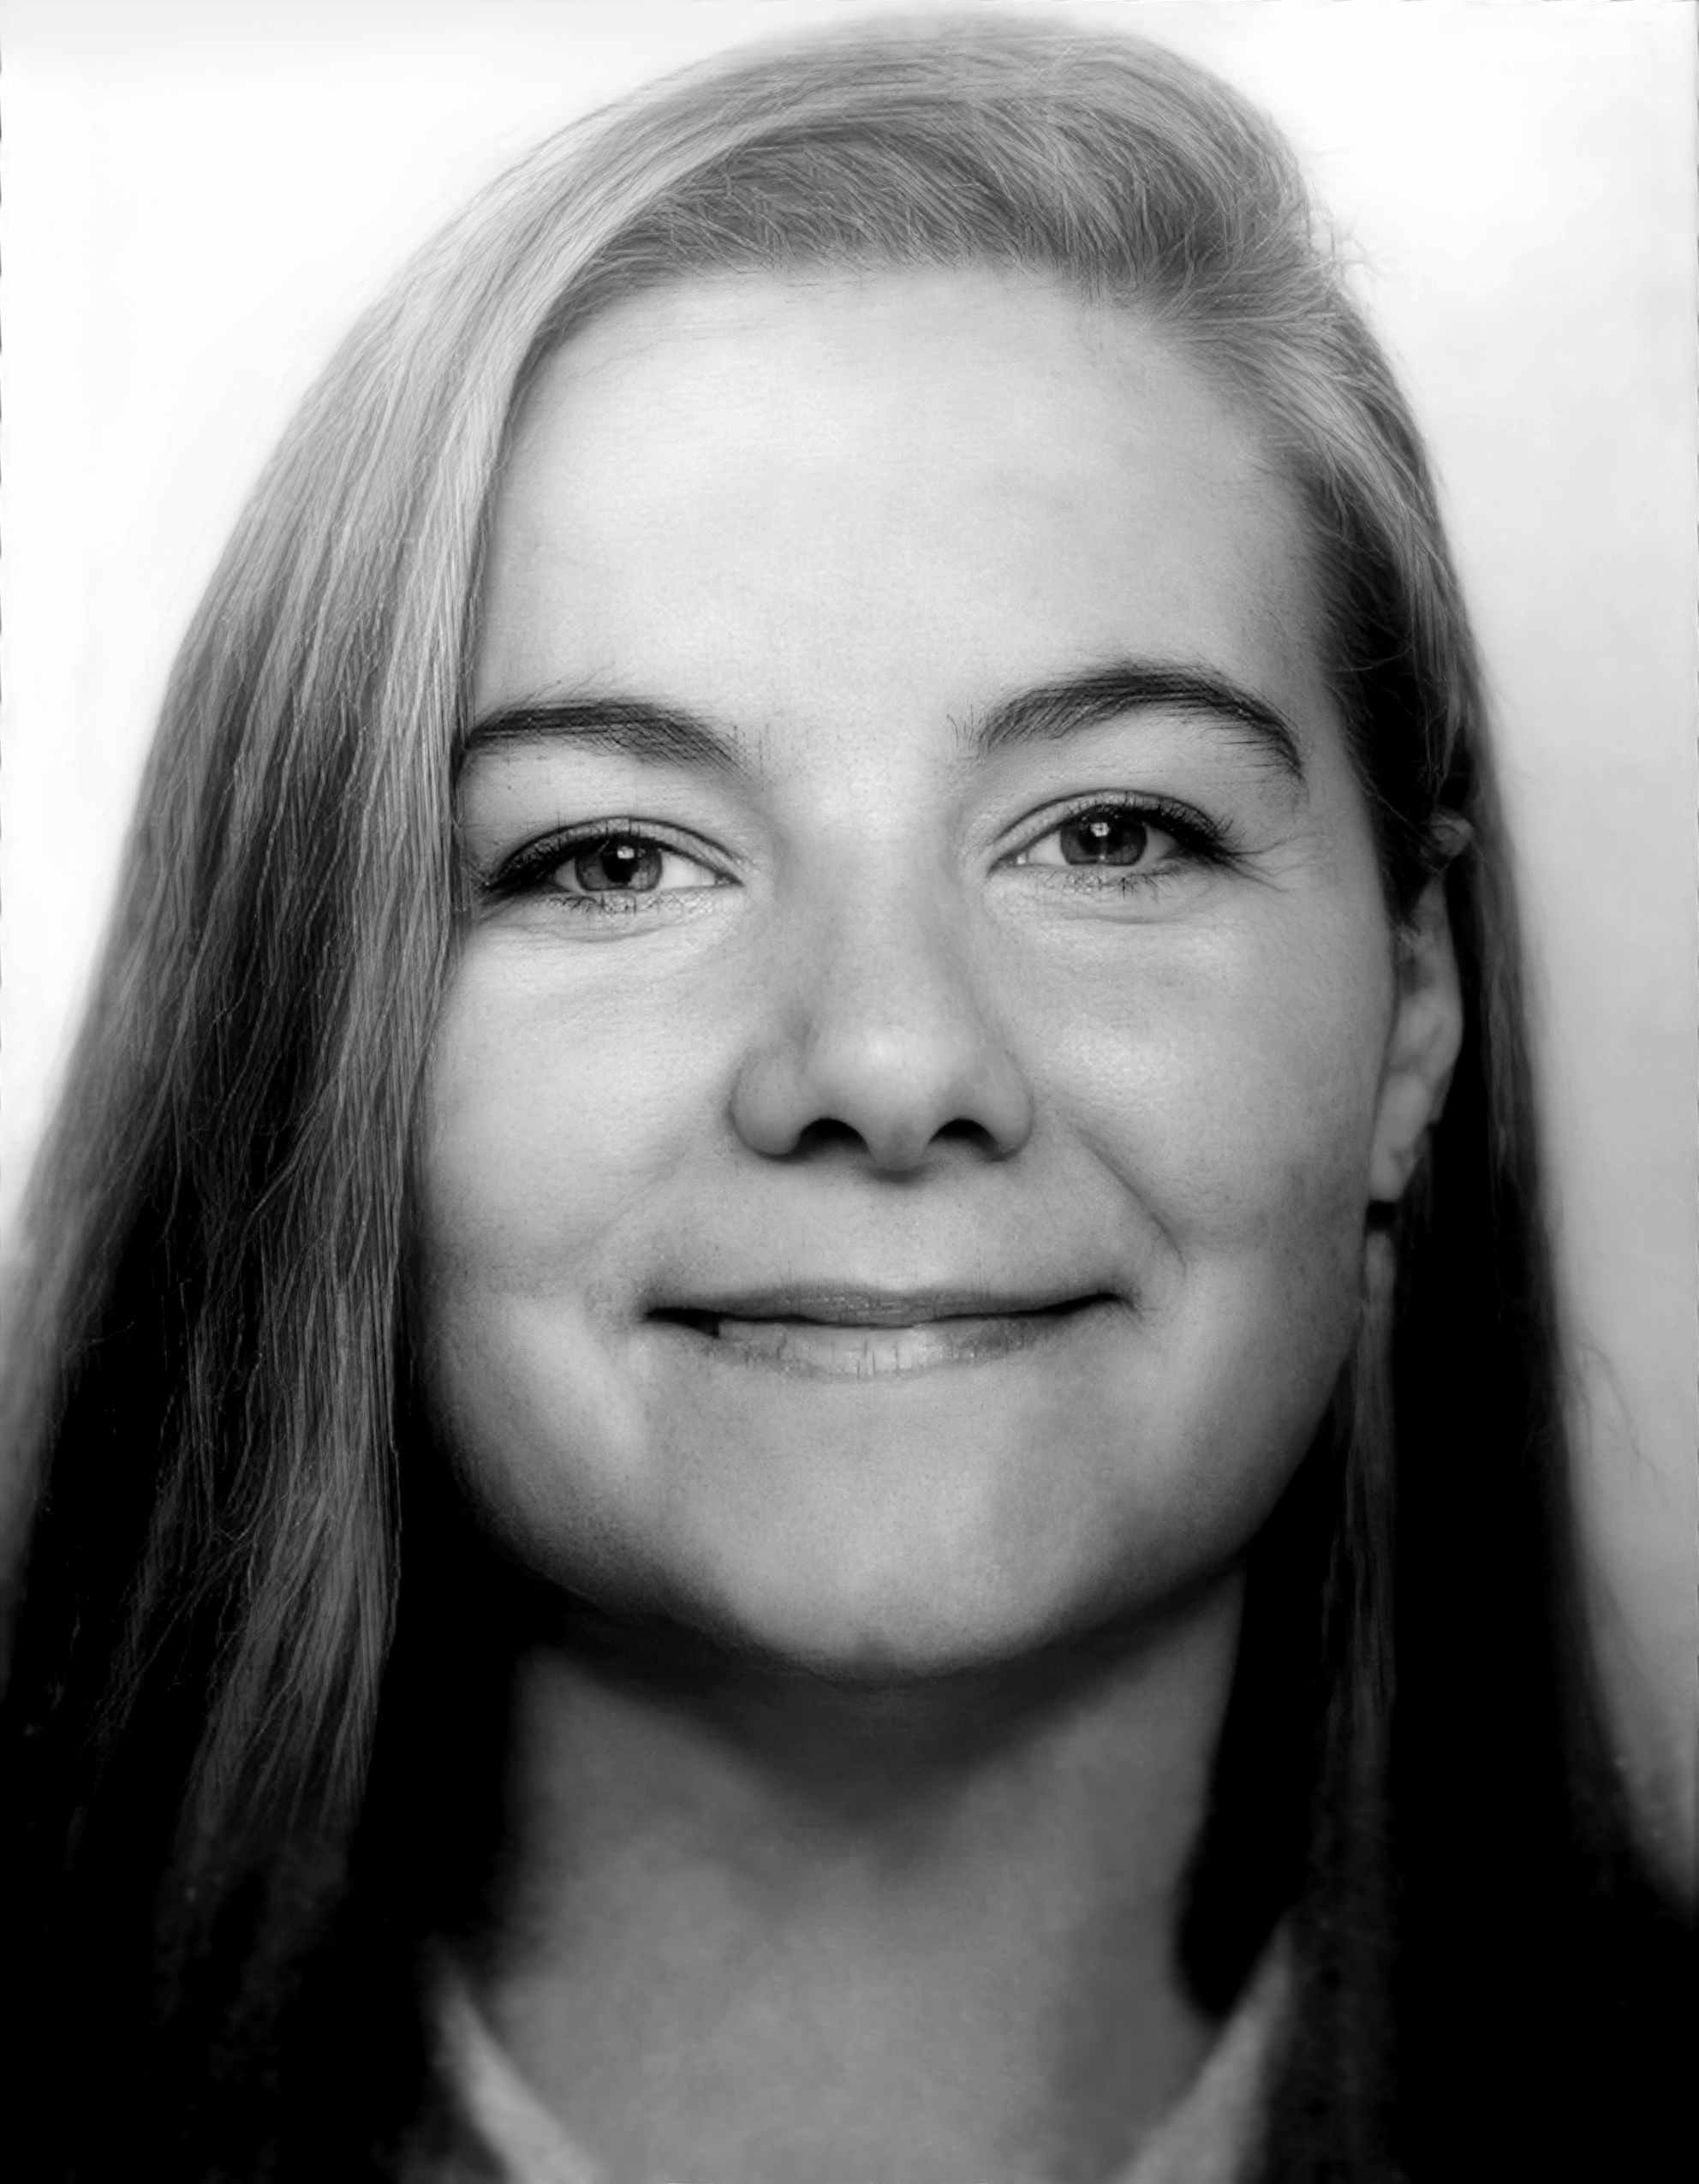 Karina Holmer